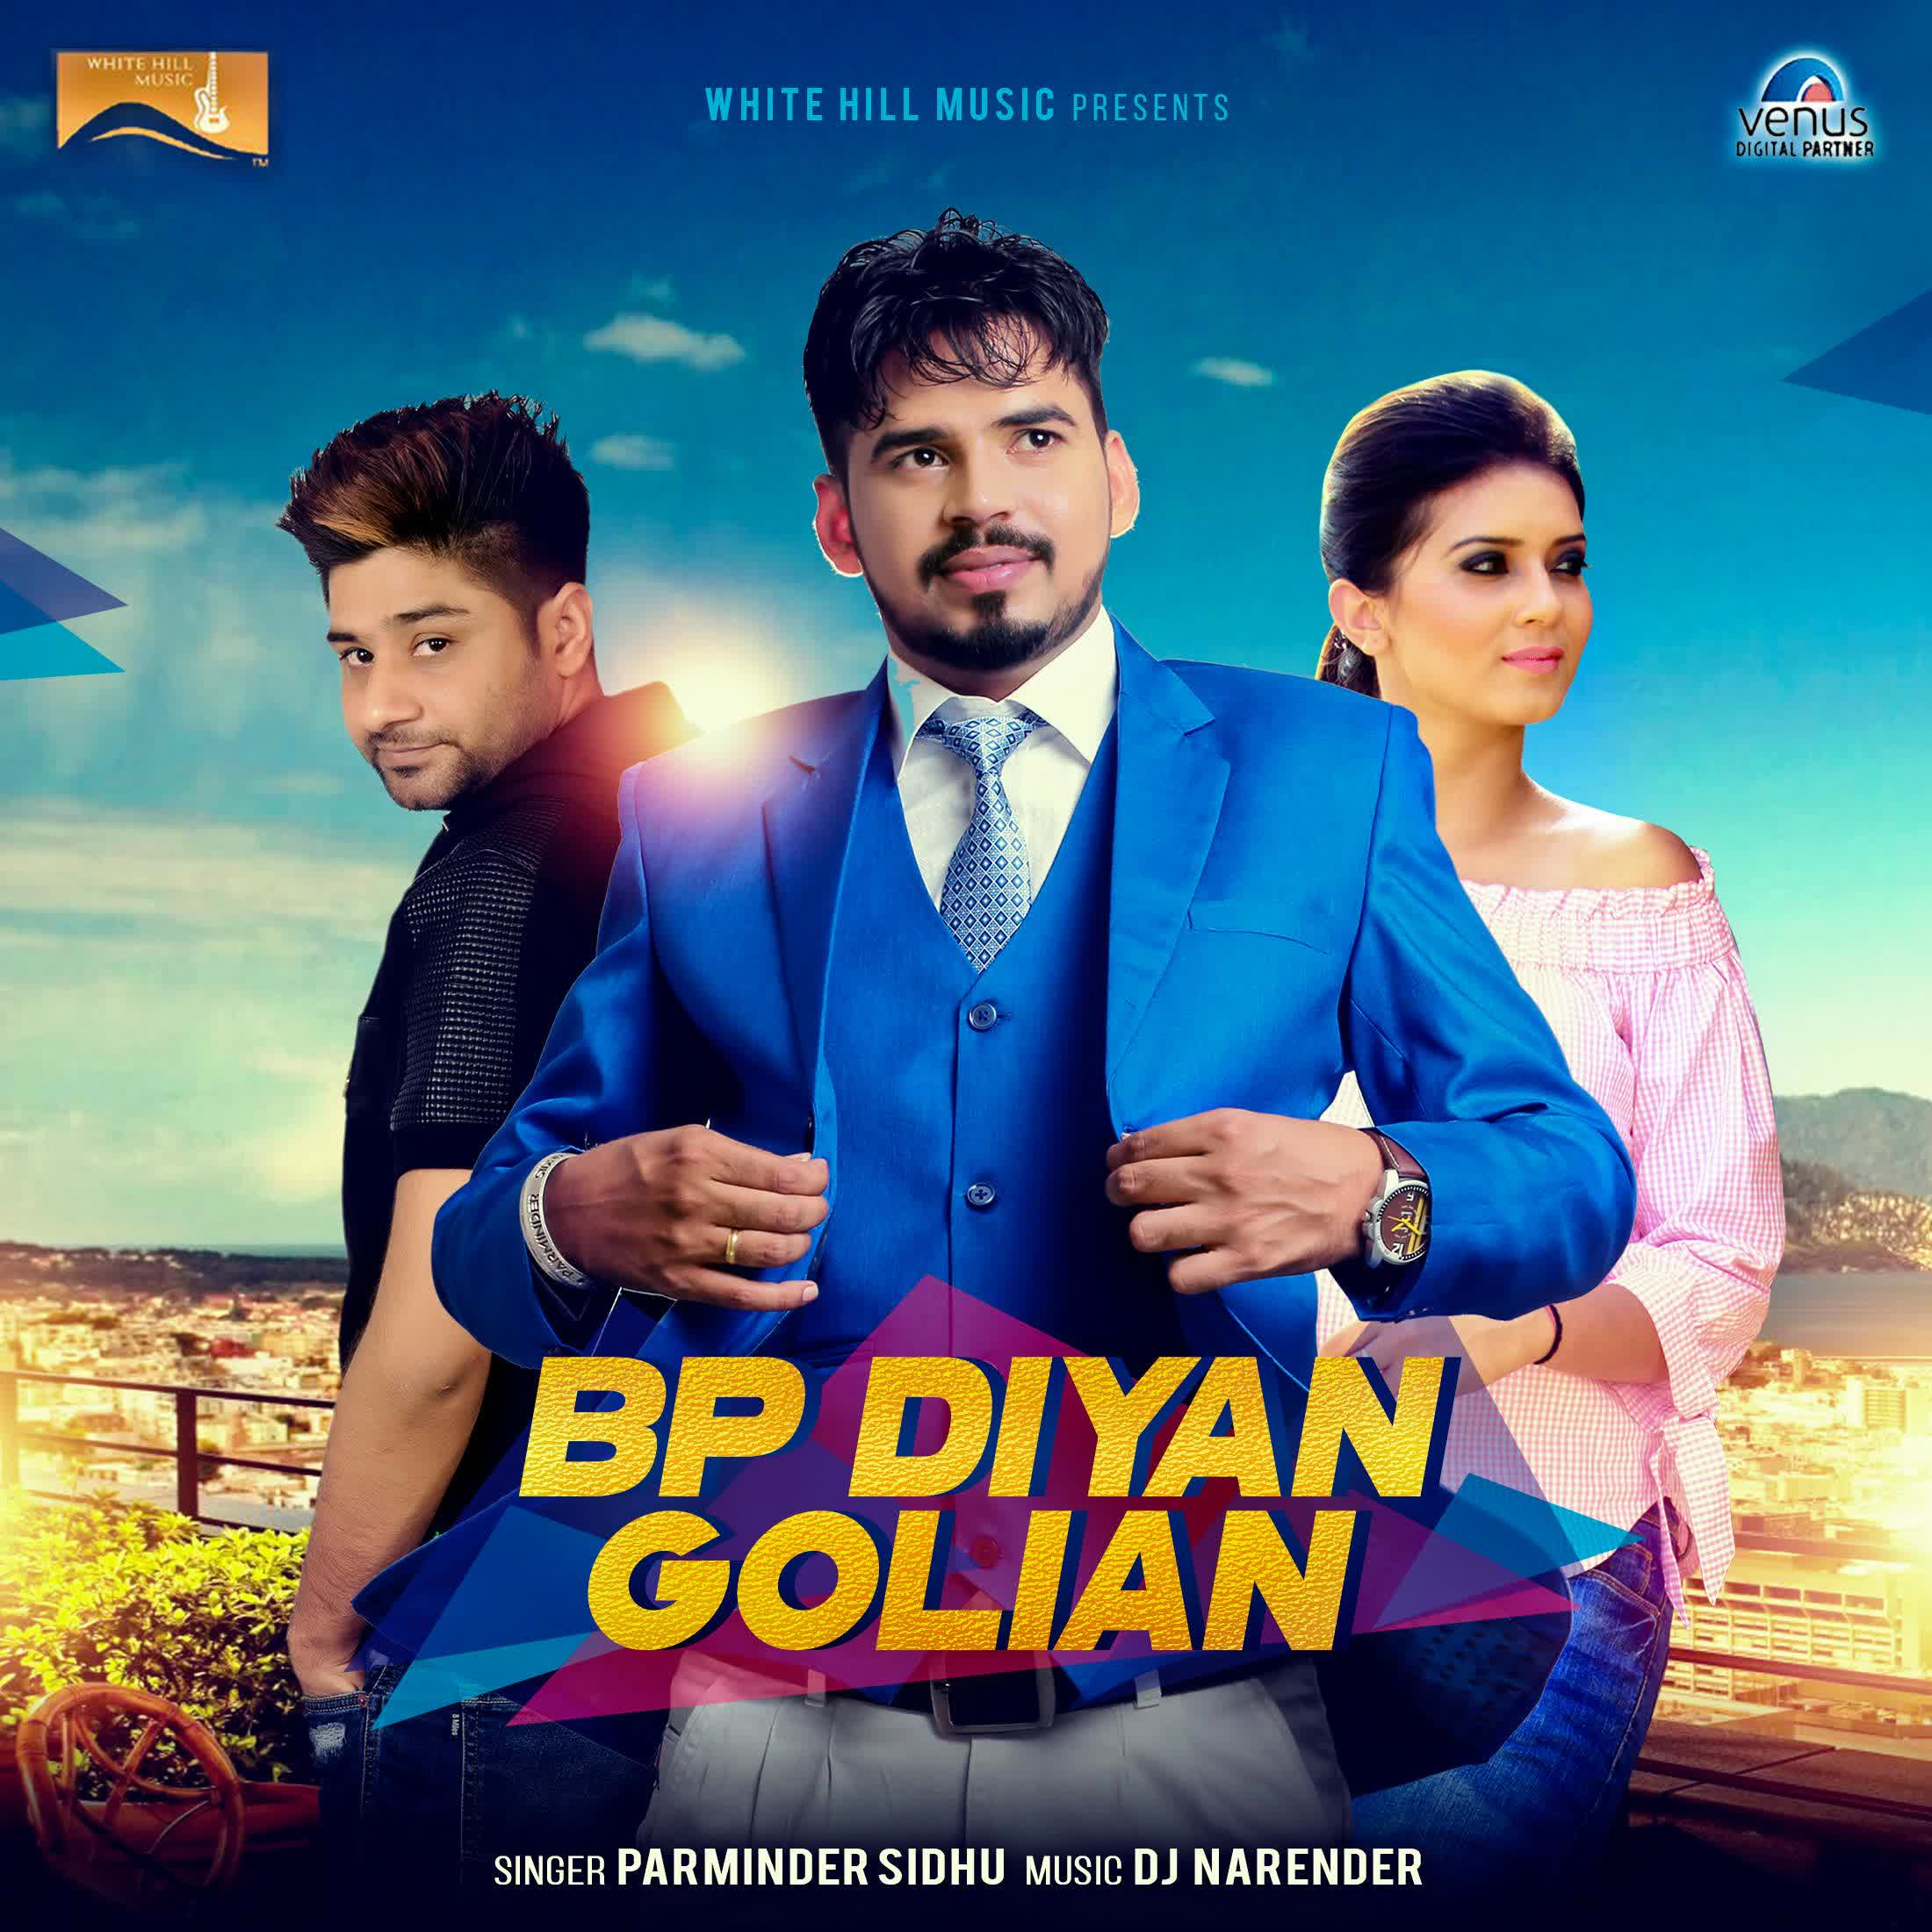 BP Diyan Golian Parminder Sidhu